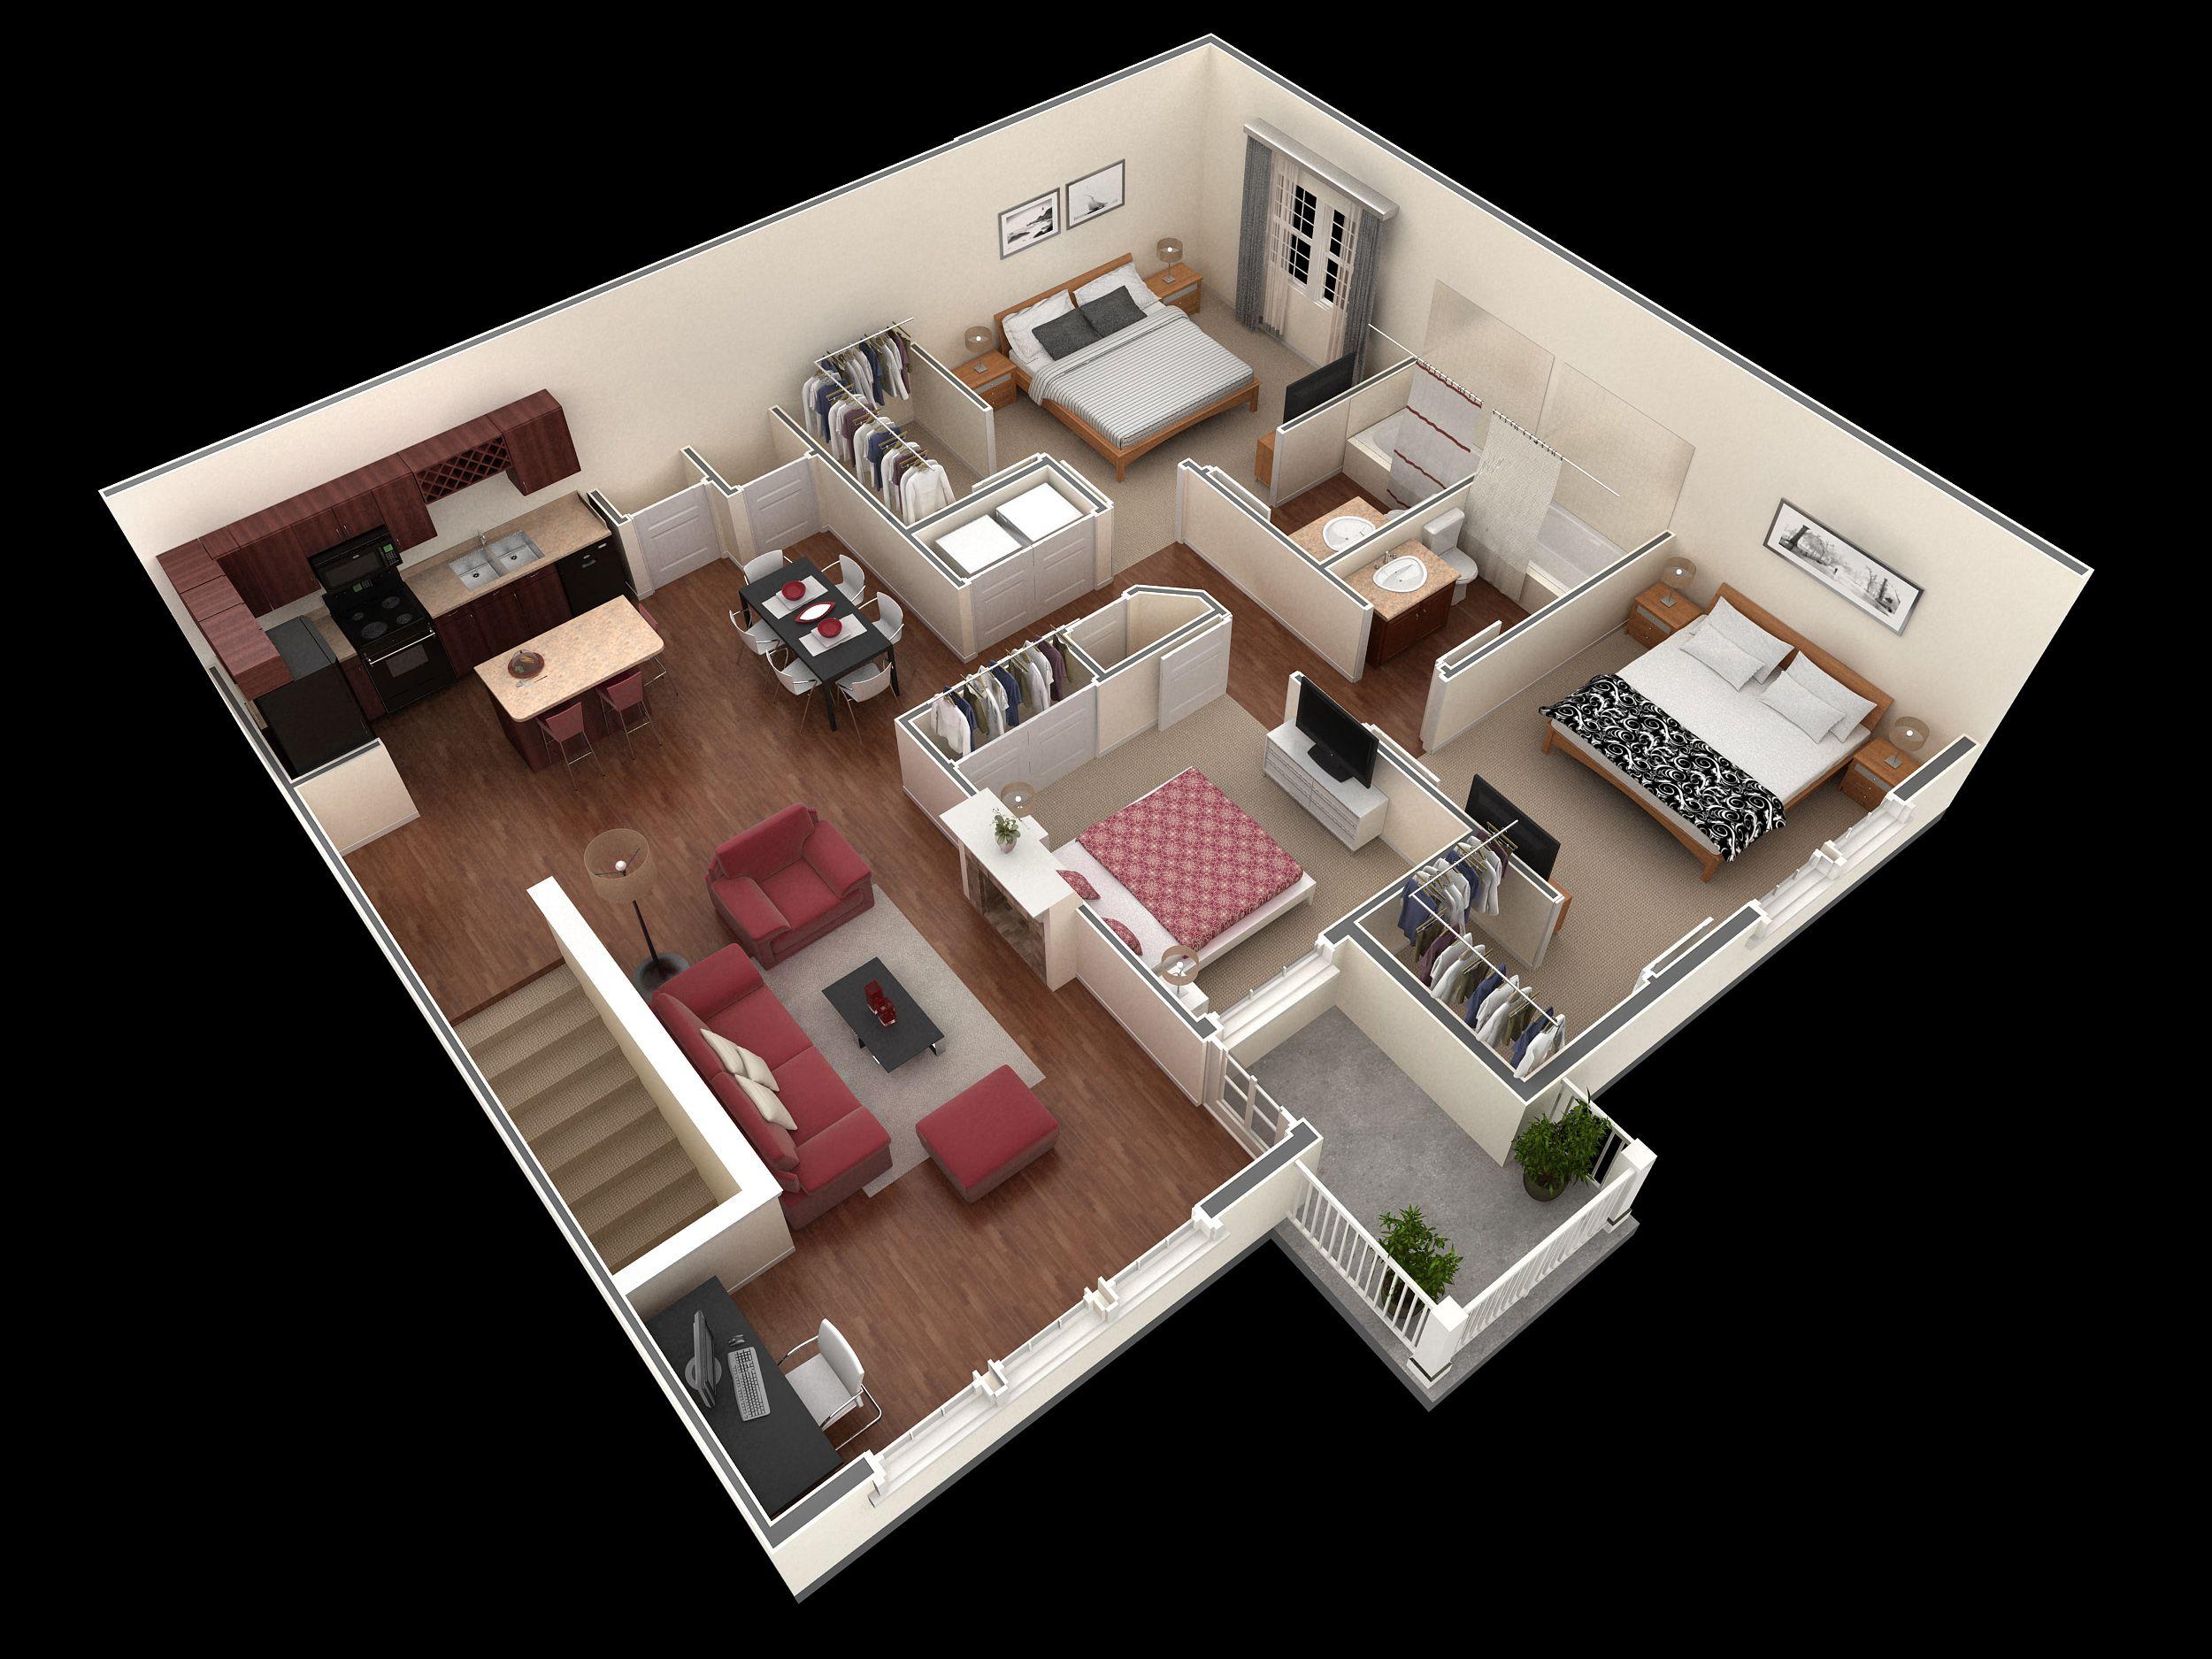 Merveilleux 3 Bedroom, 2 Bath 1,404 Sf Apartment At Springs At Tech Ridge In Austin,